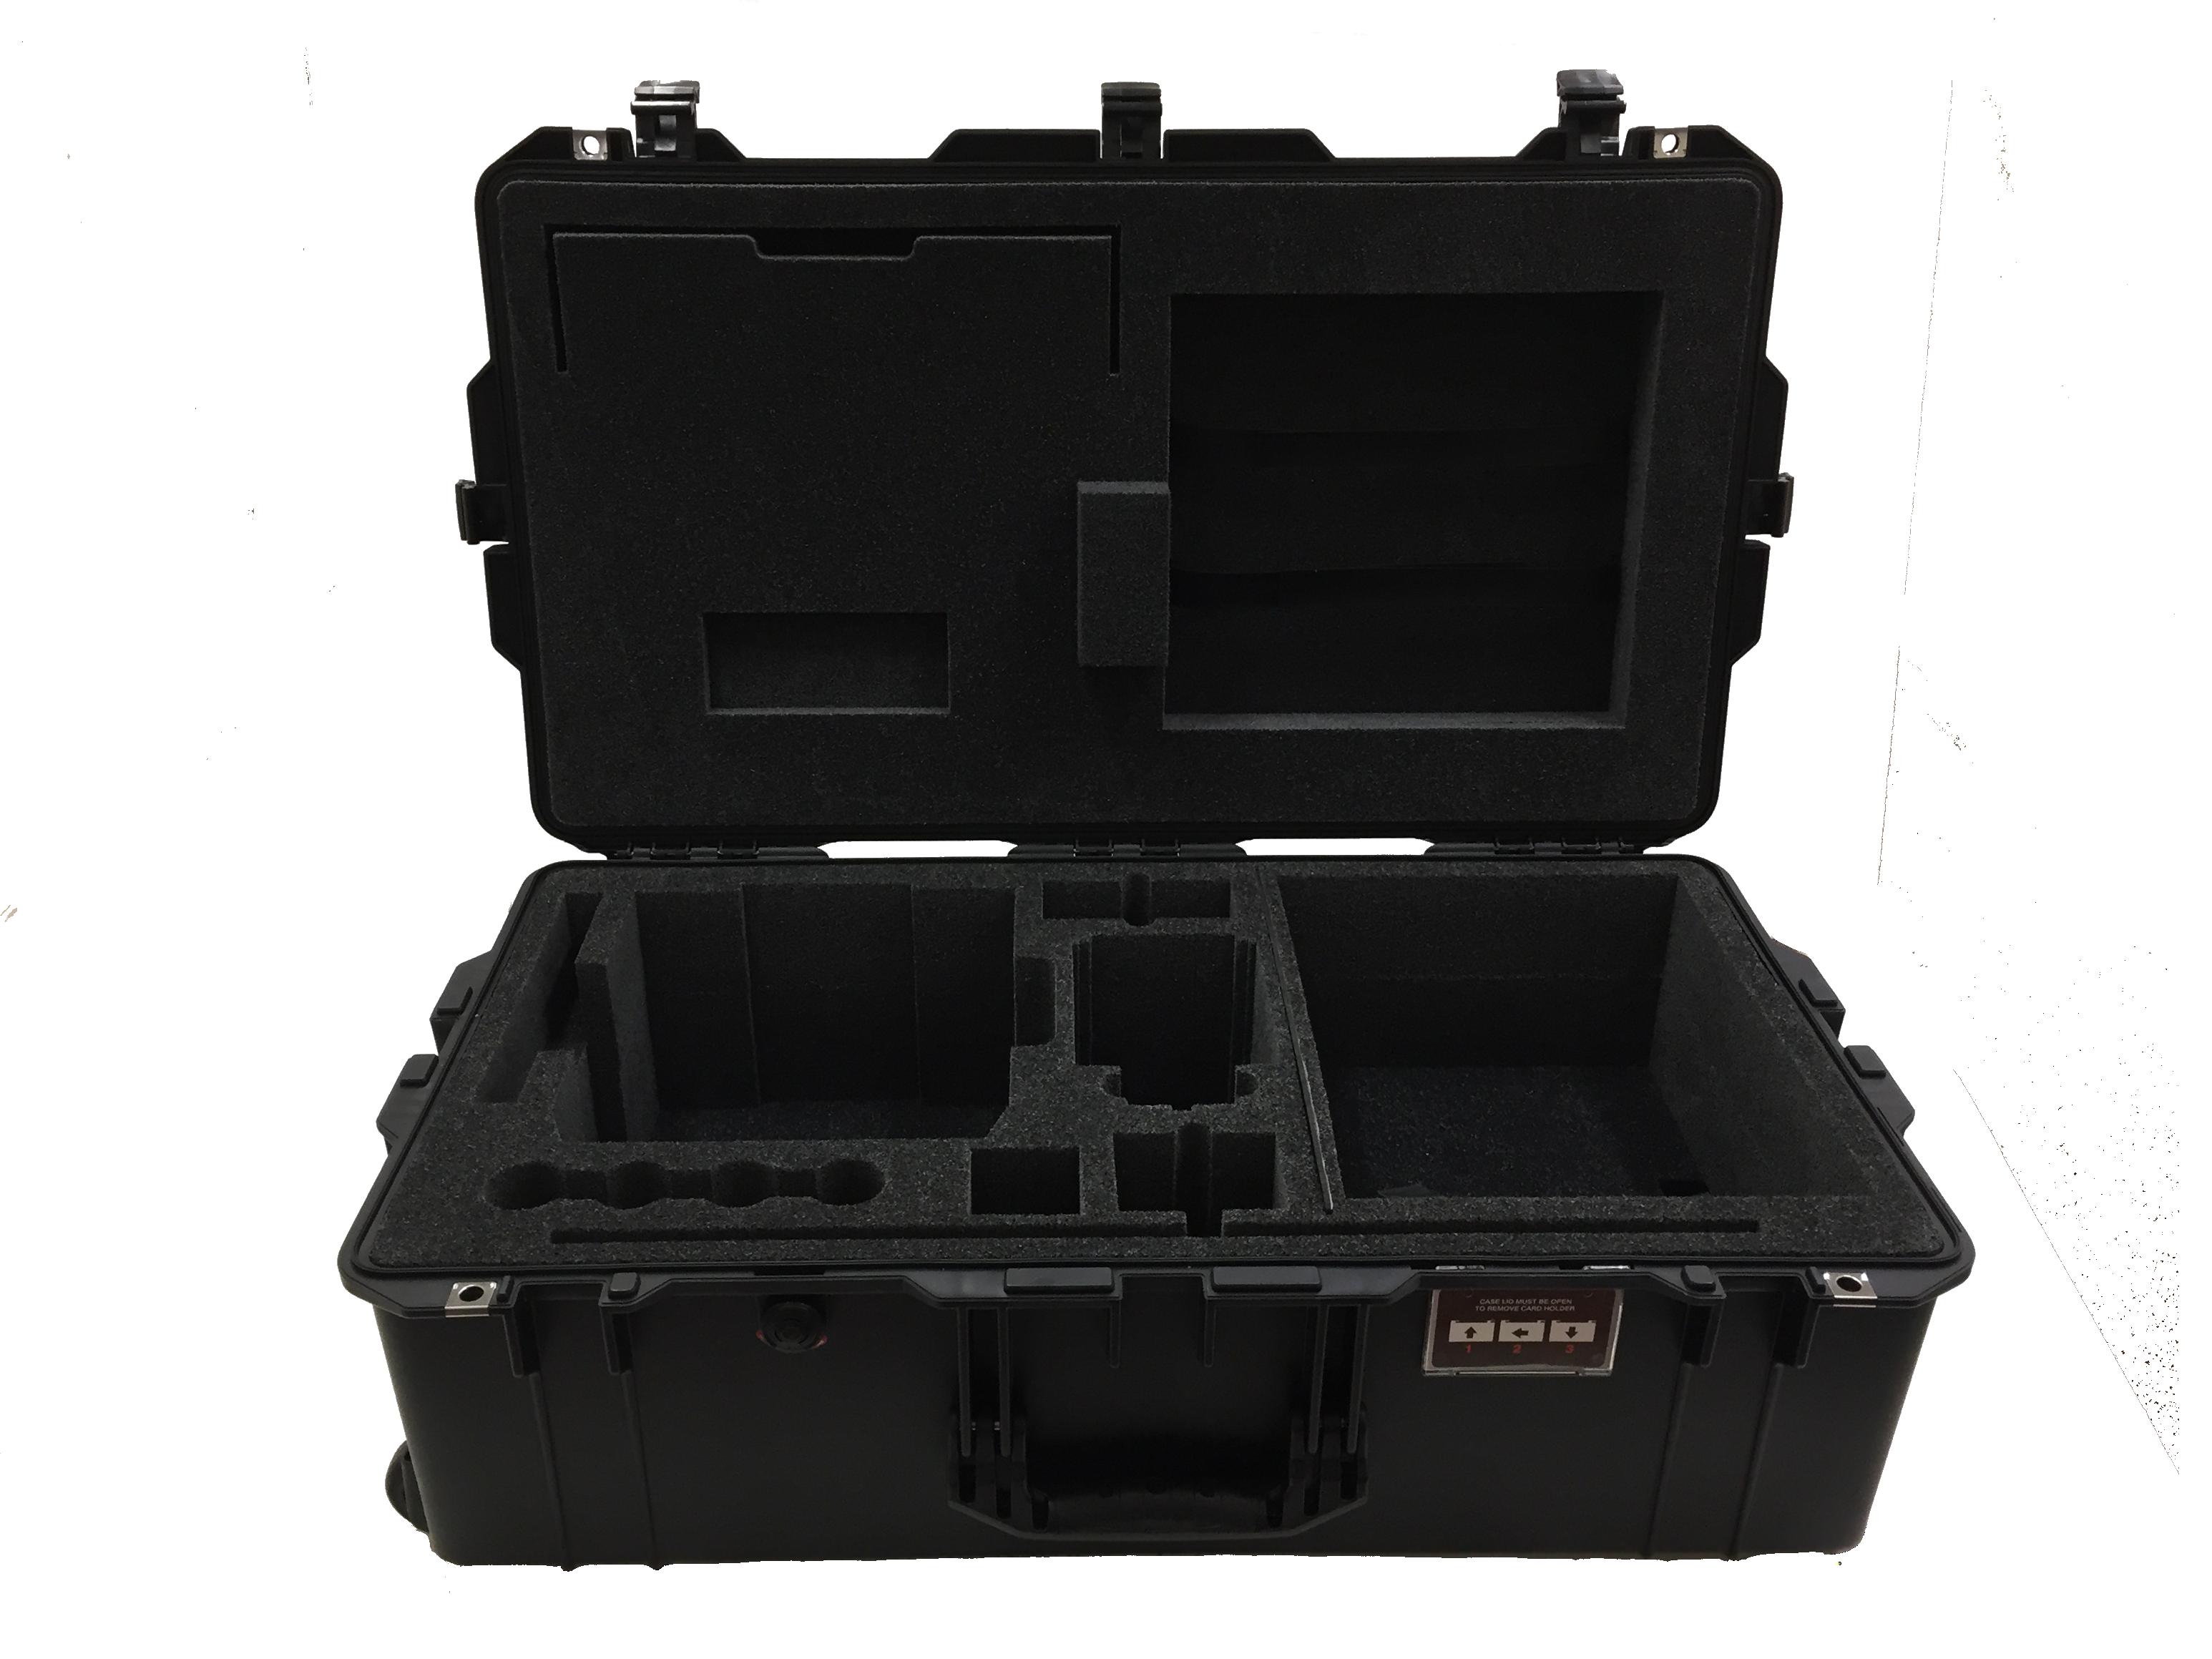 Custom Cut Foam Inserts for Equipment Travel Case